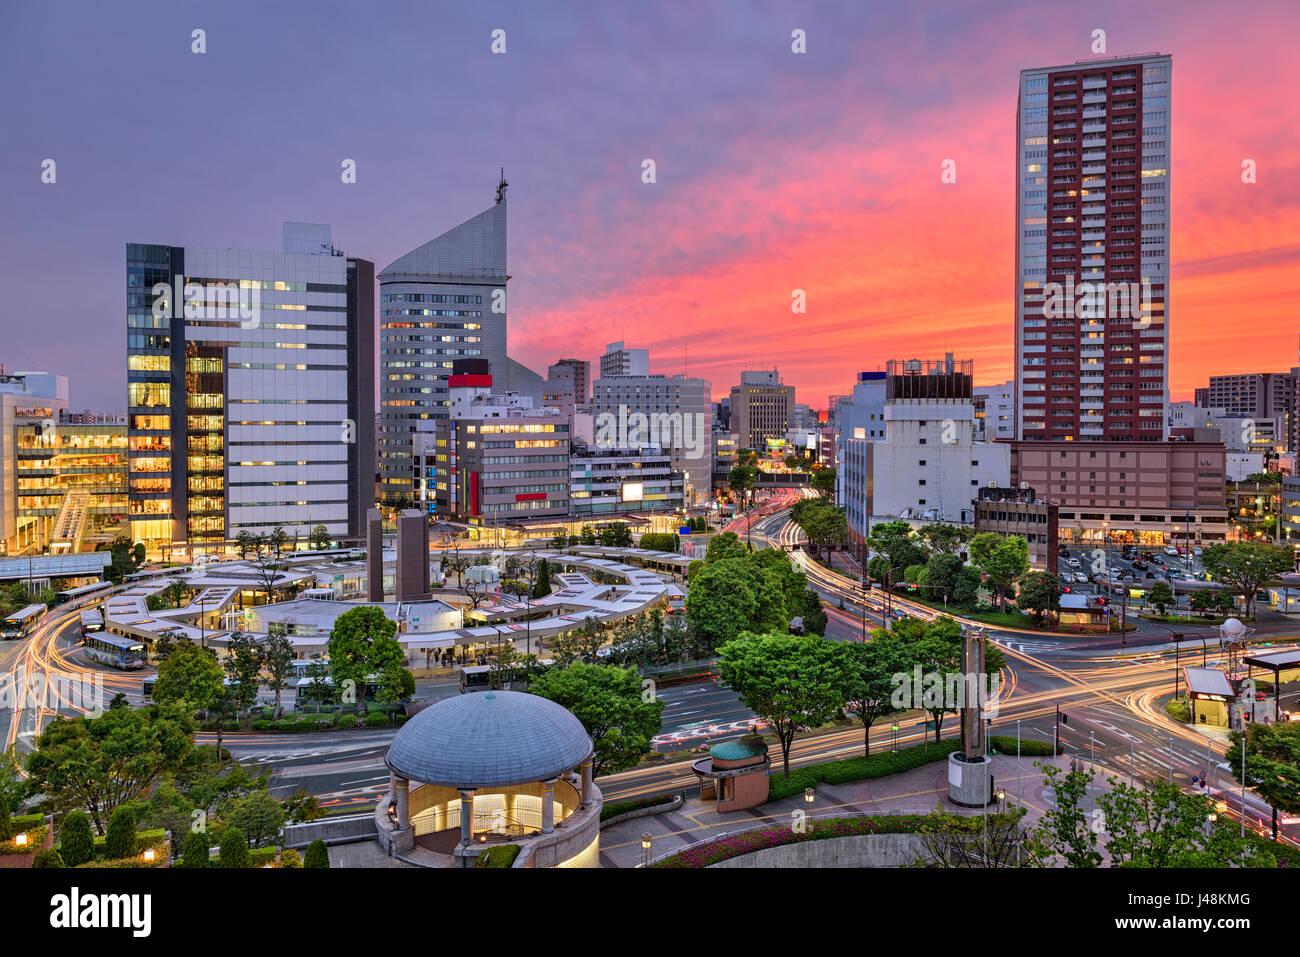 Hamamatsu City, Japan skyline at twilight. - Stock Image